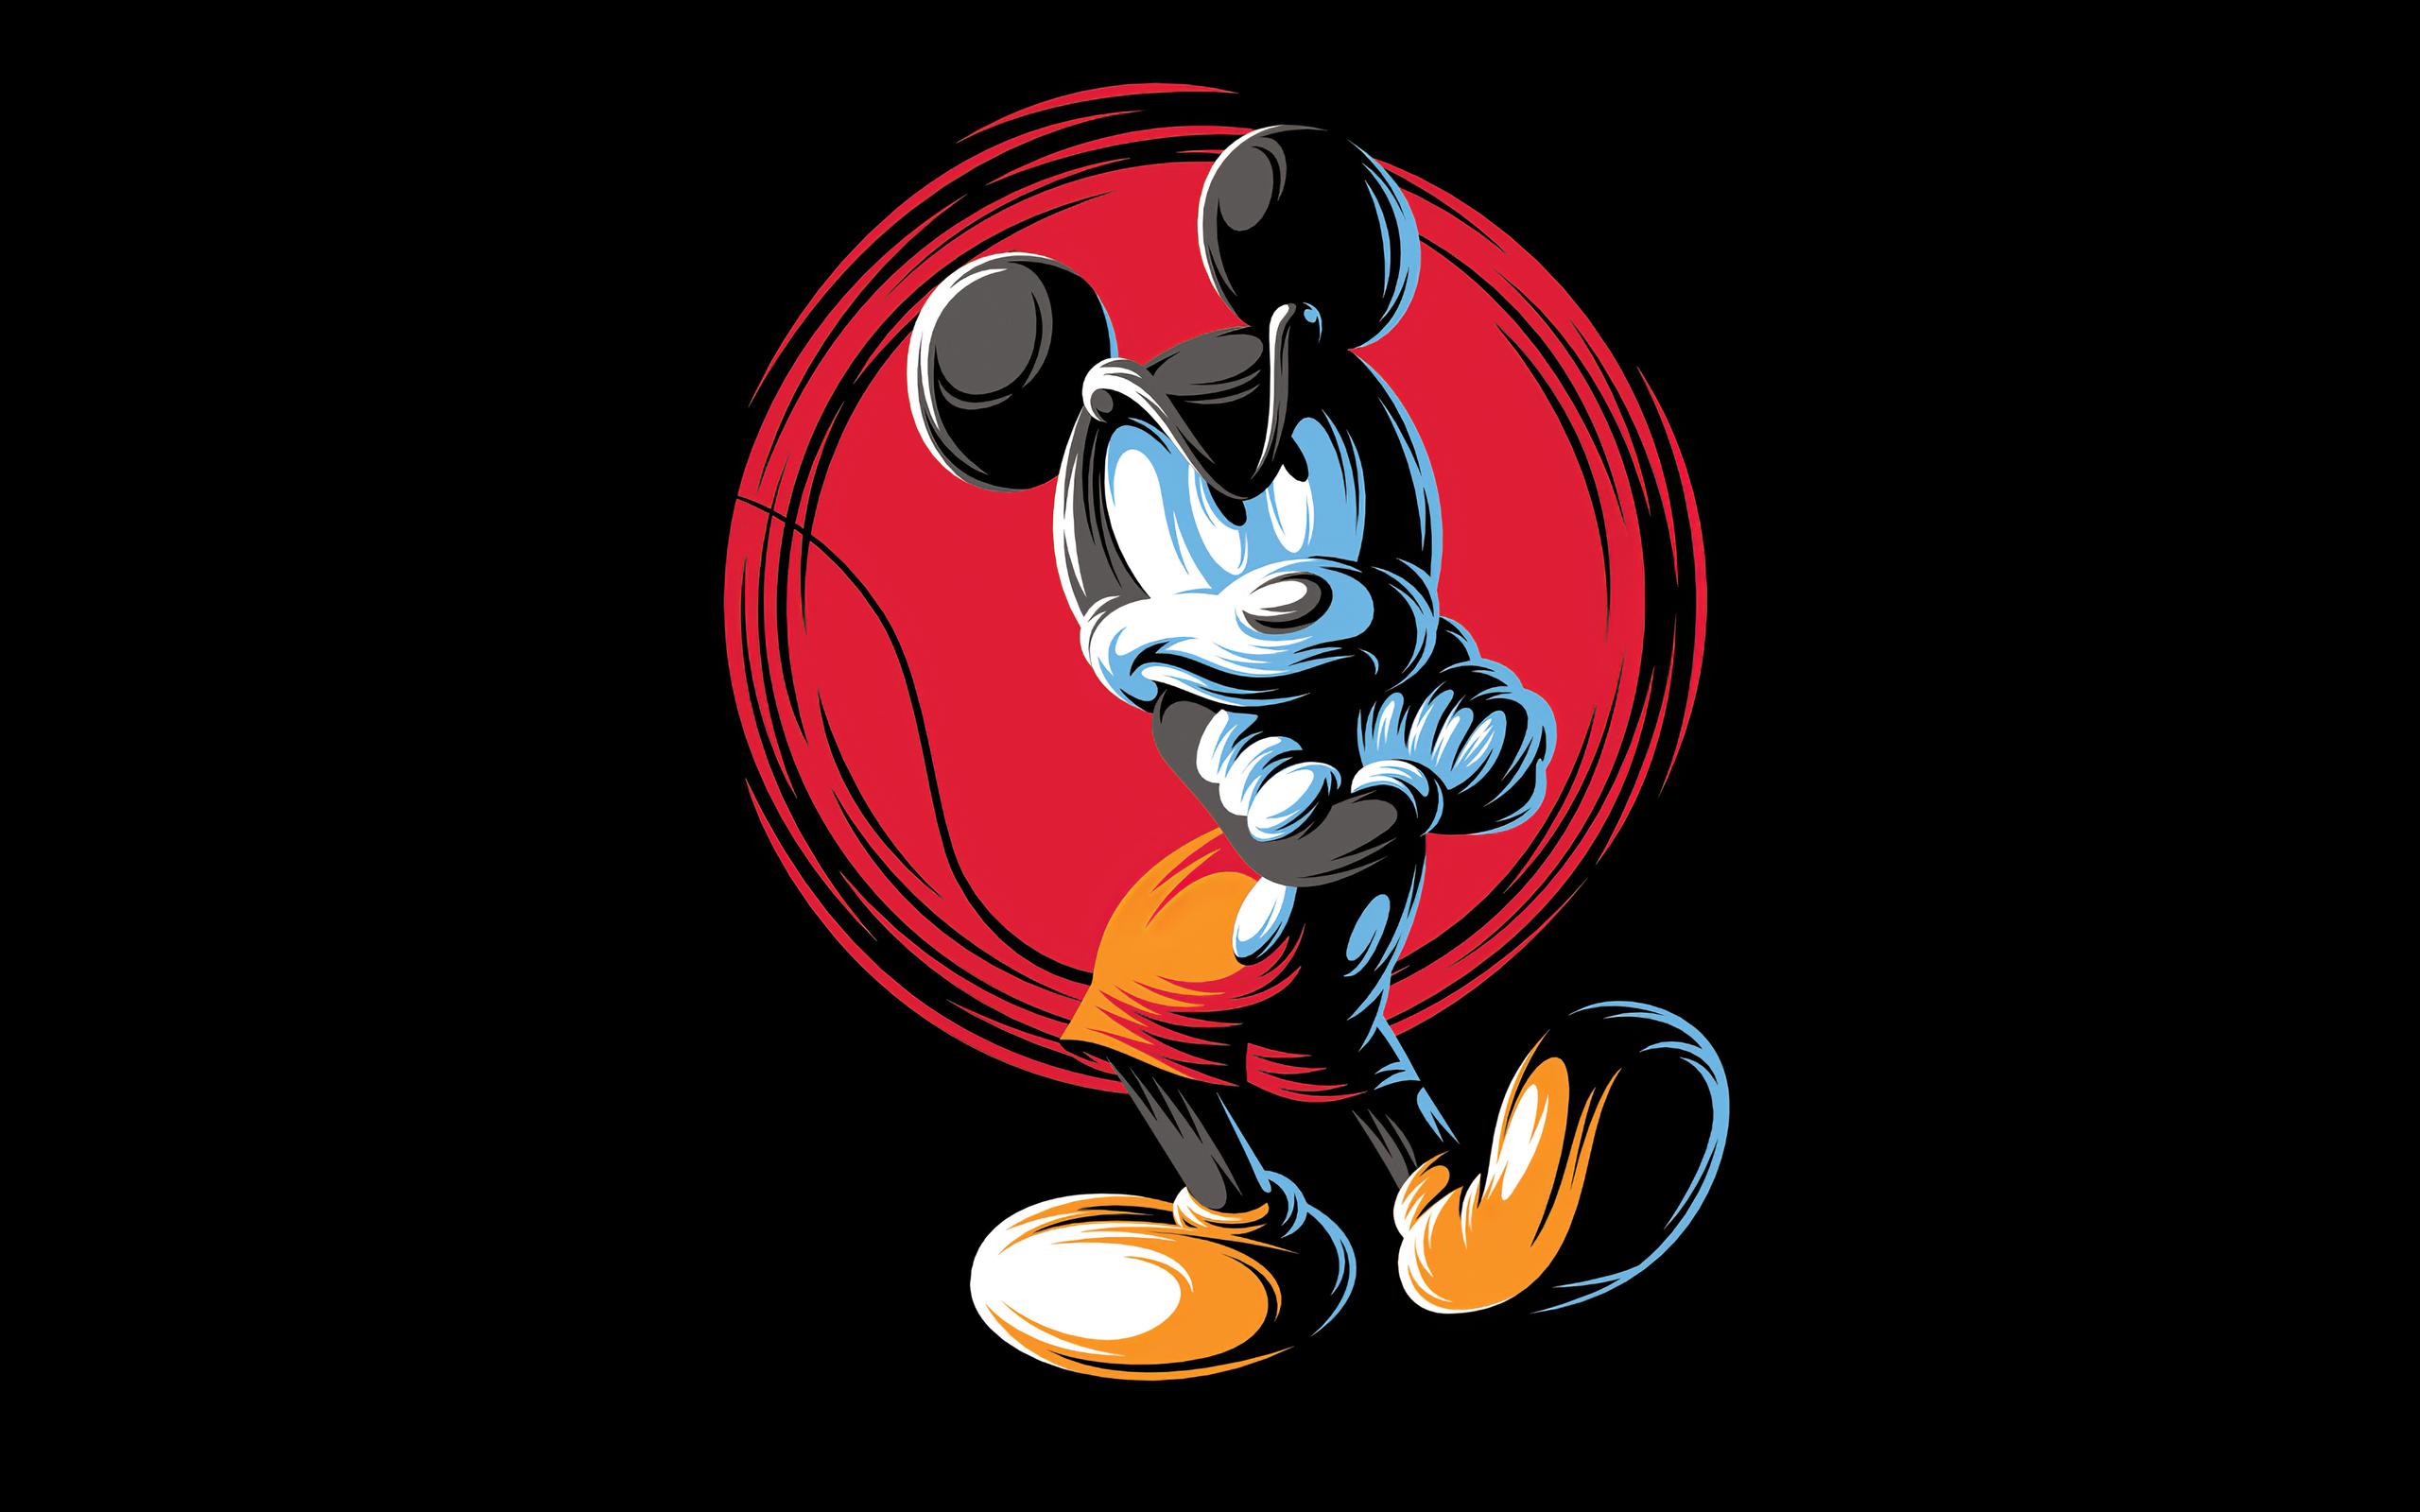 mickey-mouse-minimal-art-4k-gx.jpg